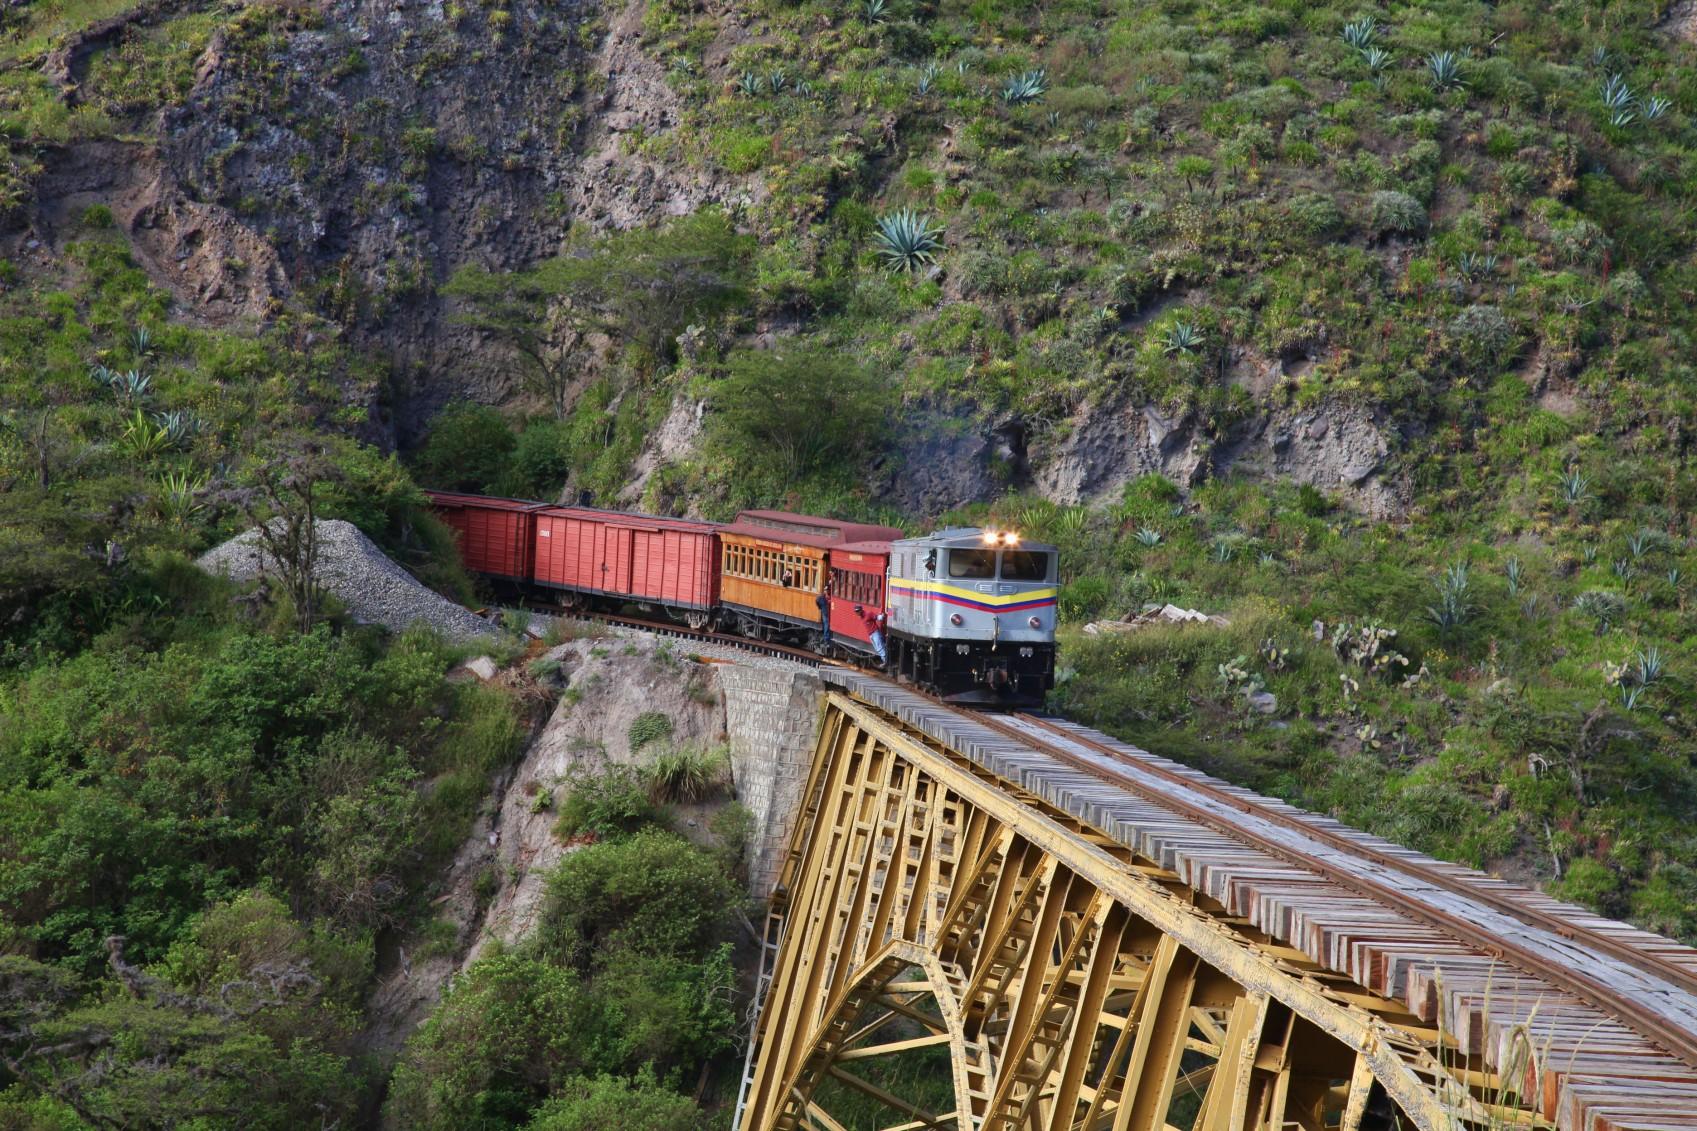 ecu23-take-the-tren-de-la-libertad-tren-crucero-free